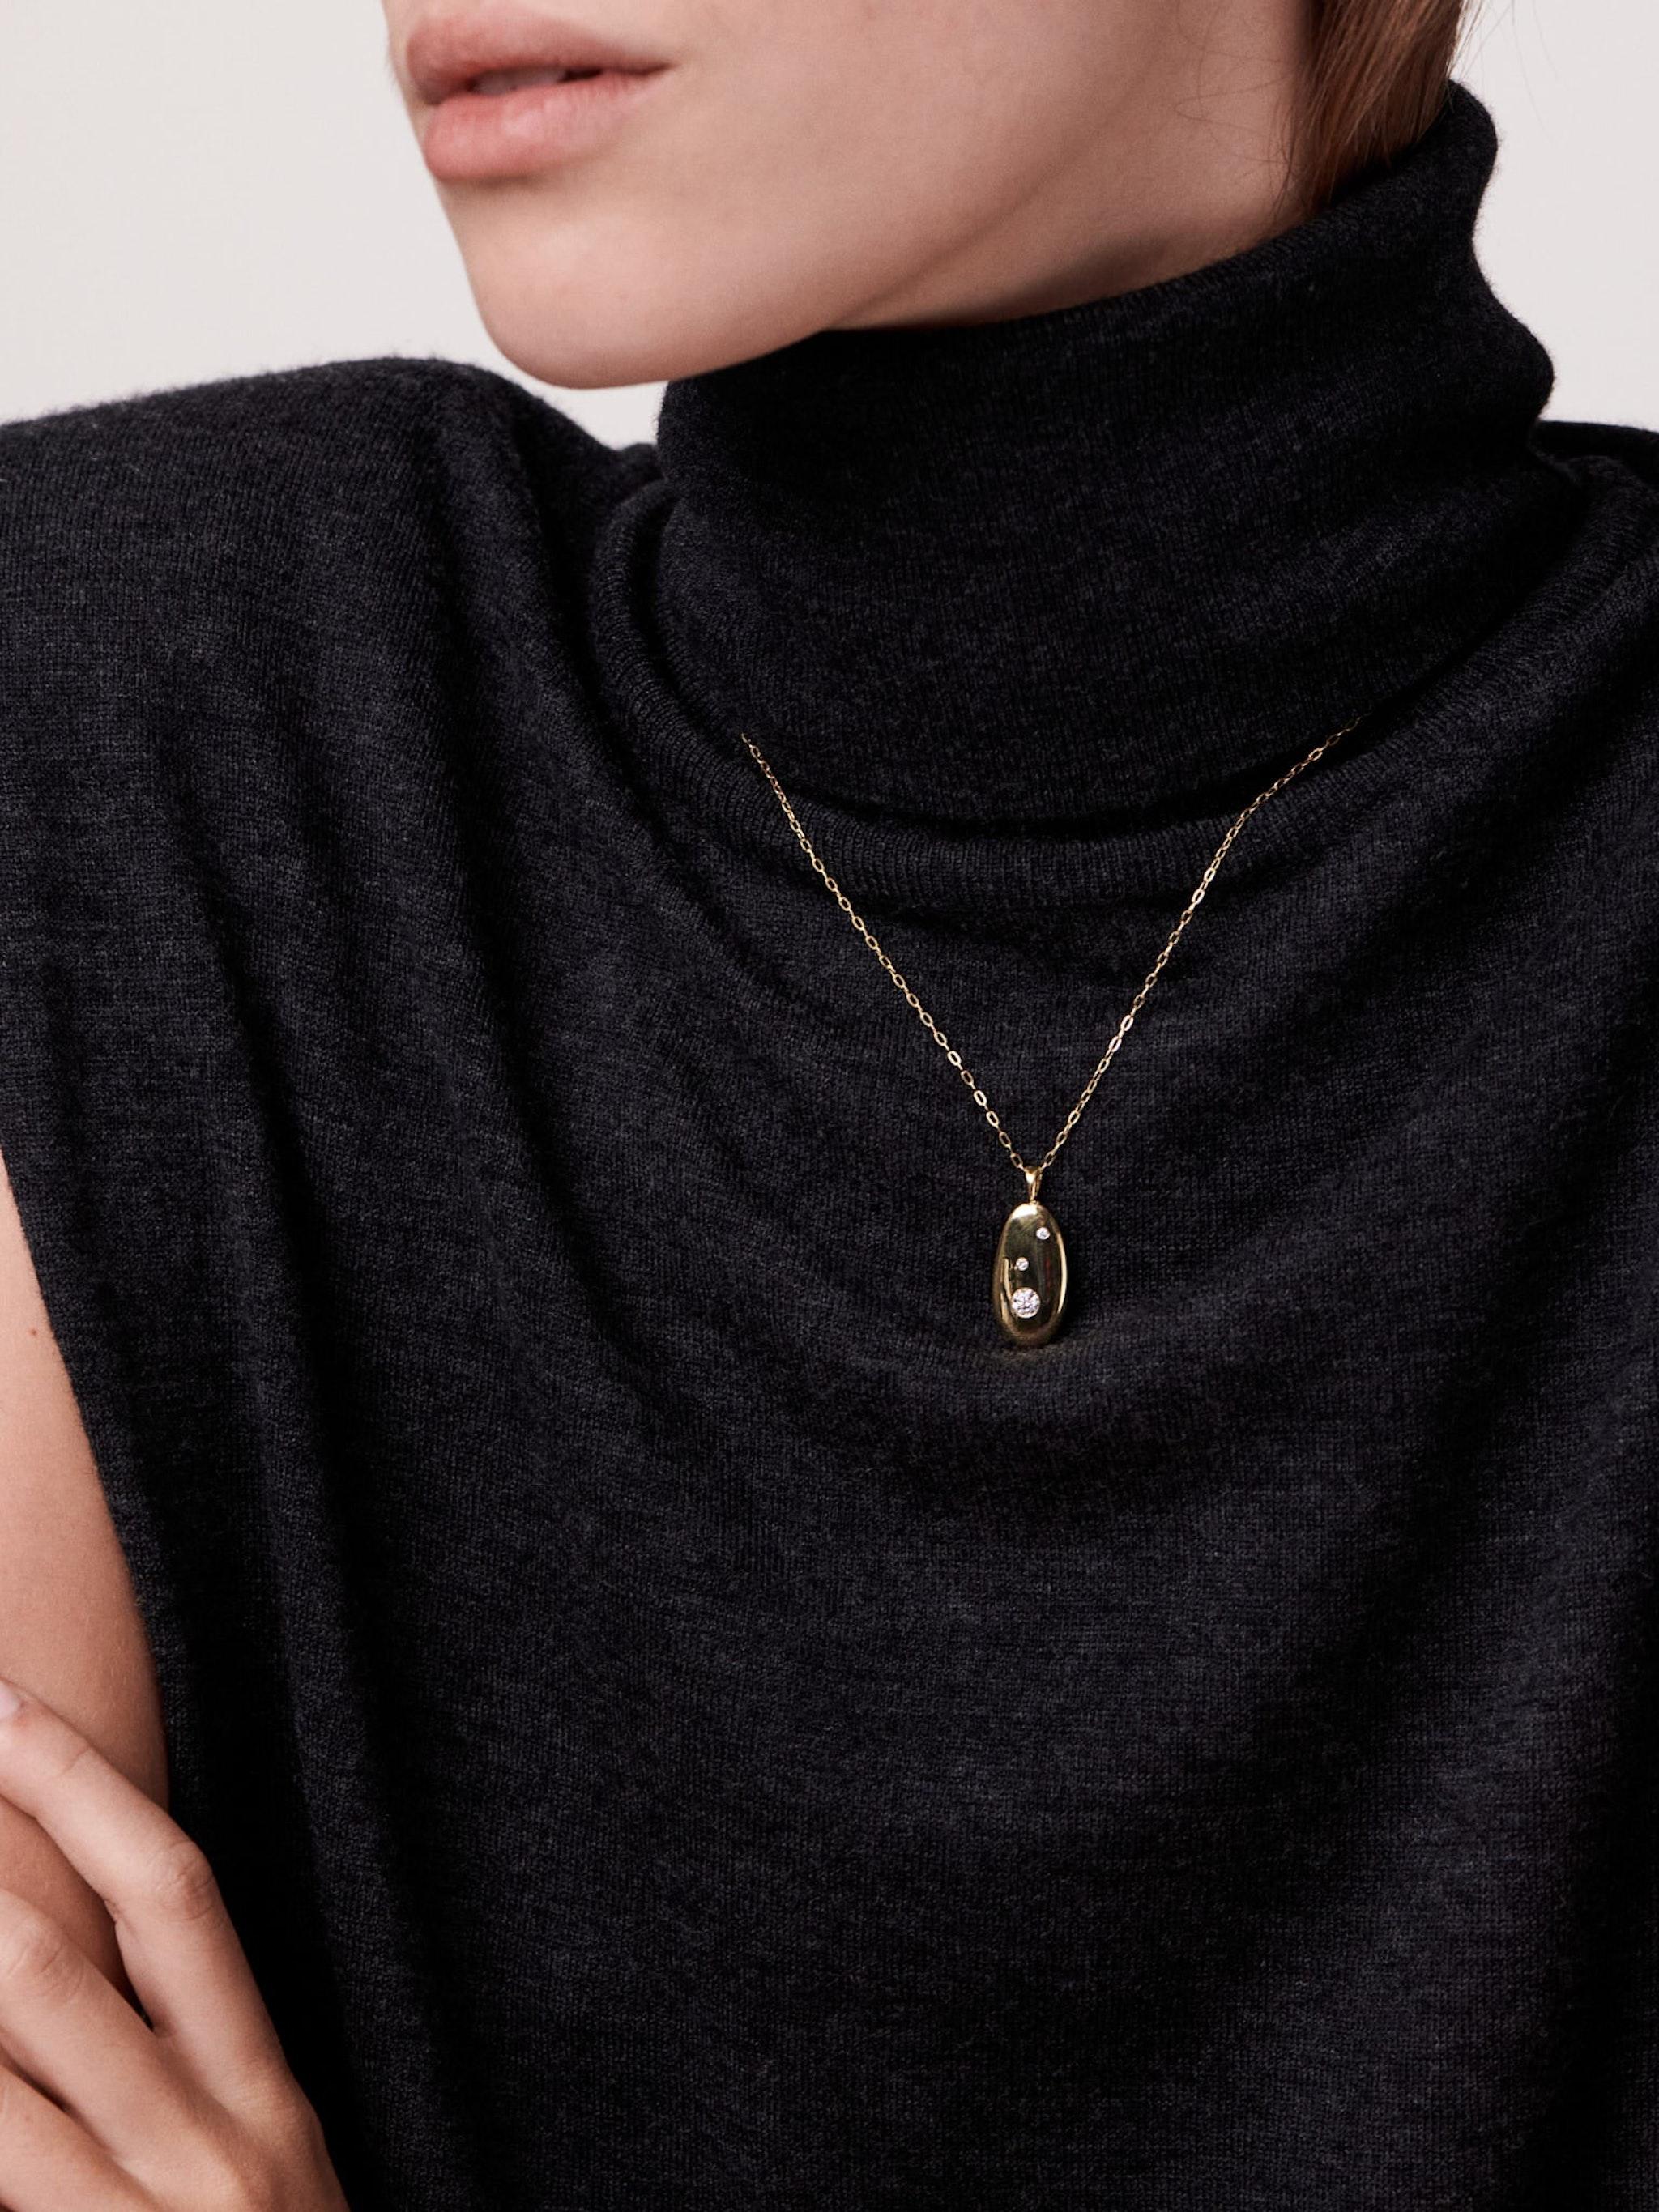 V1 gold and diamond necklace